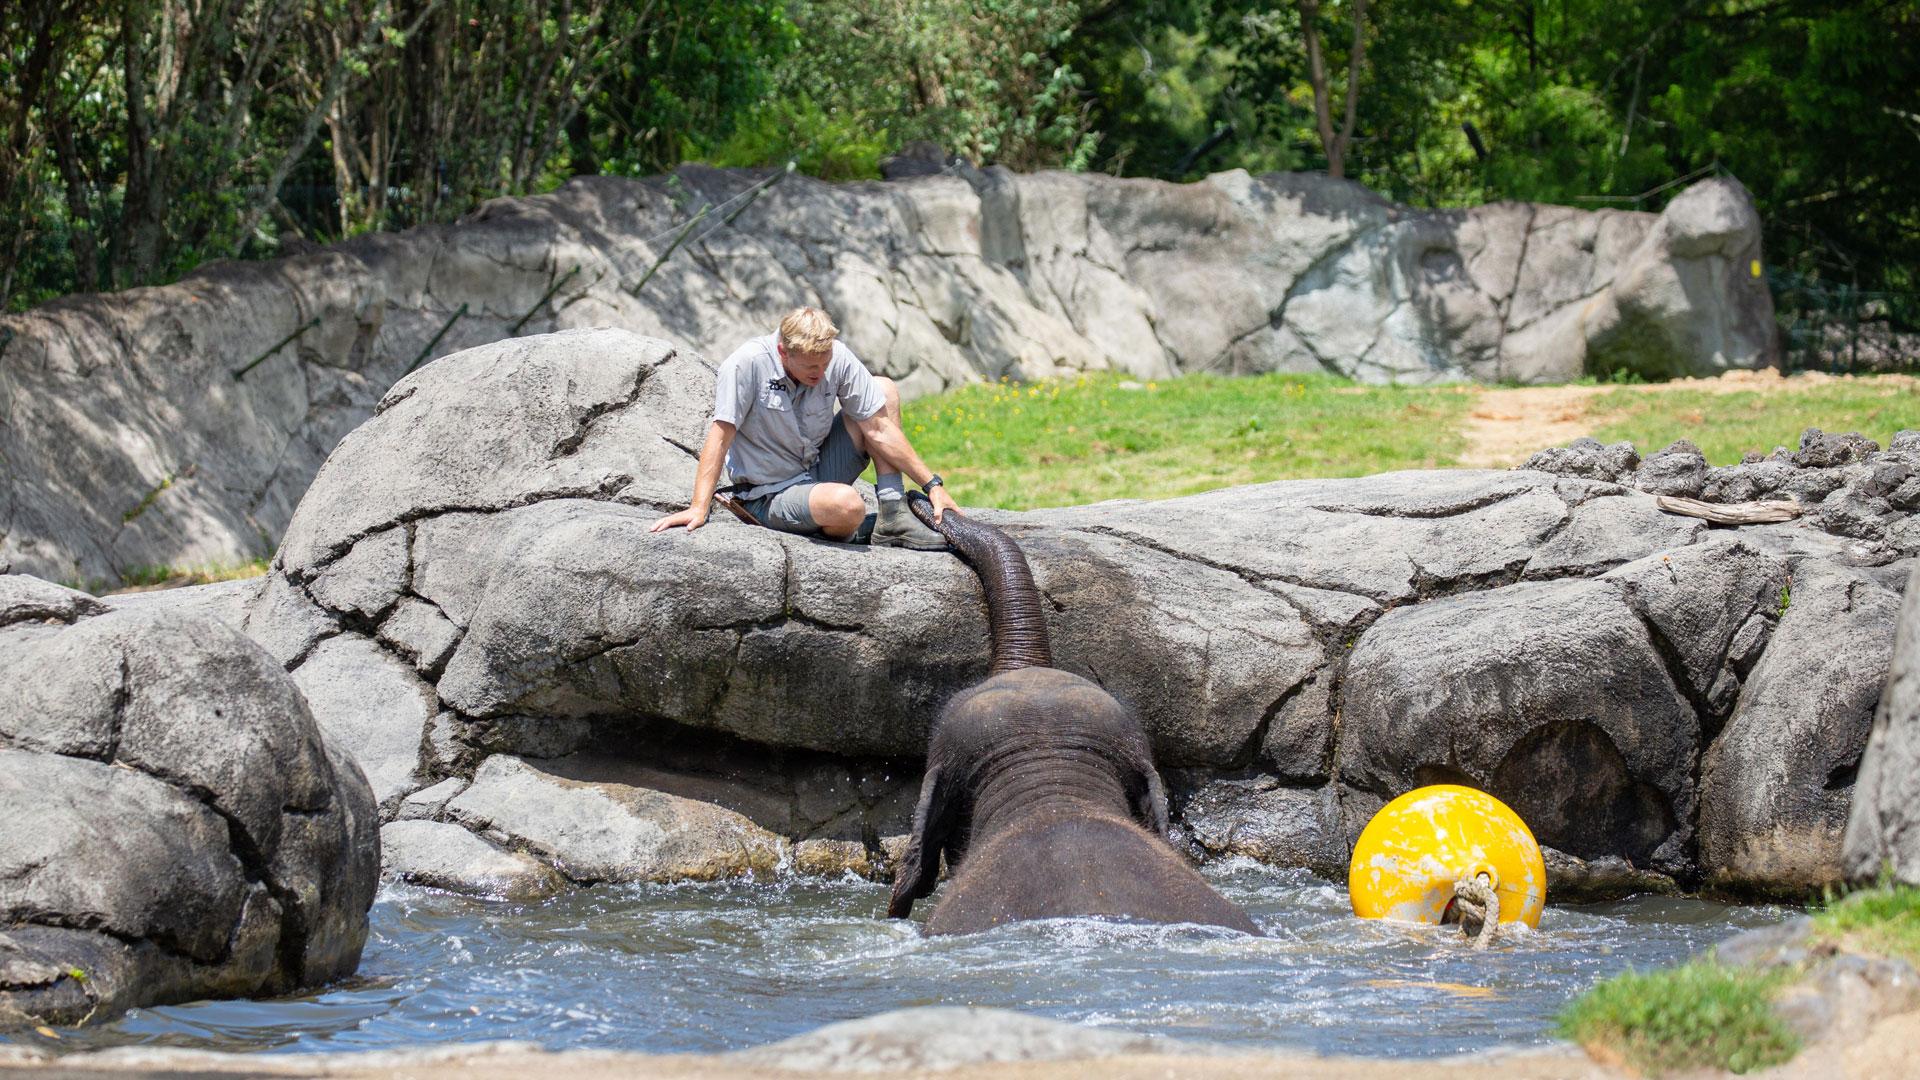 https://rfacdn.nz/zoo/assets/media/elephant-news-gallery-6.jpg